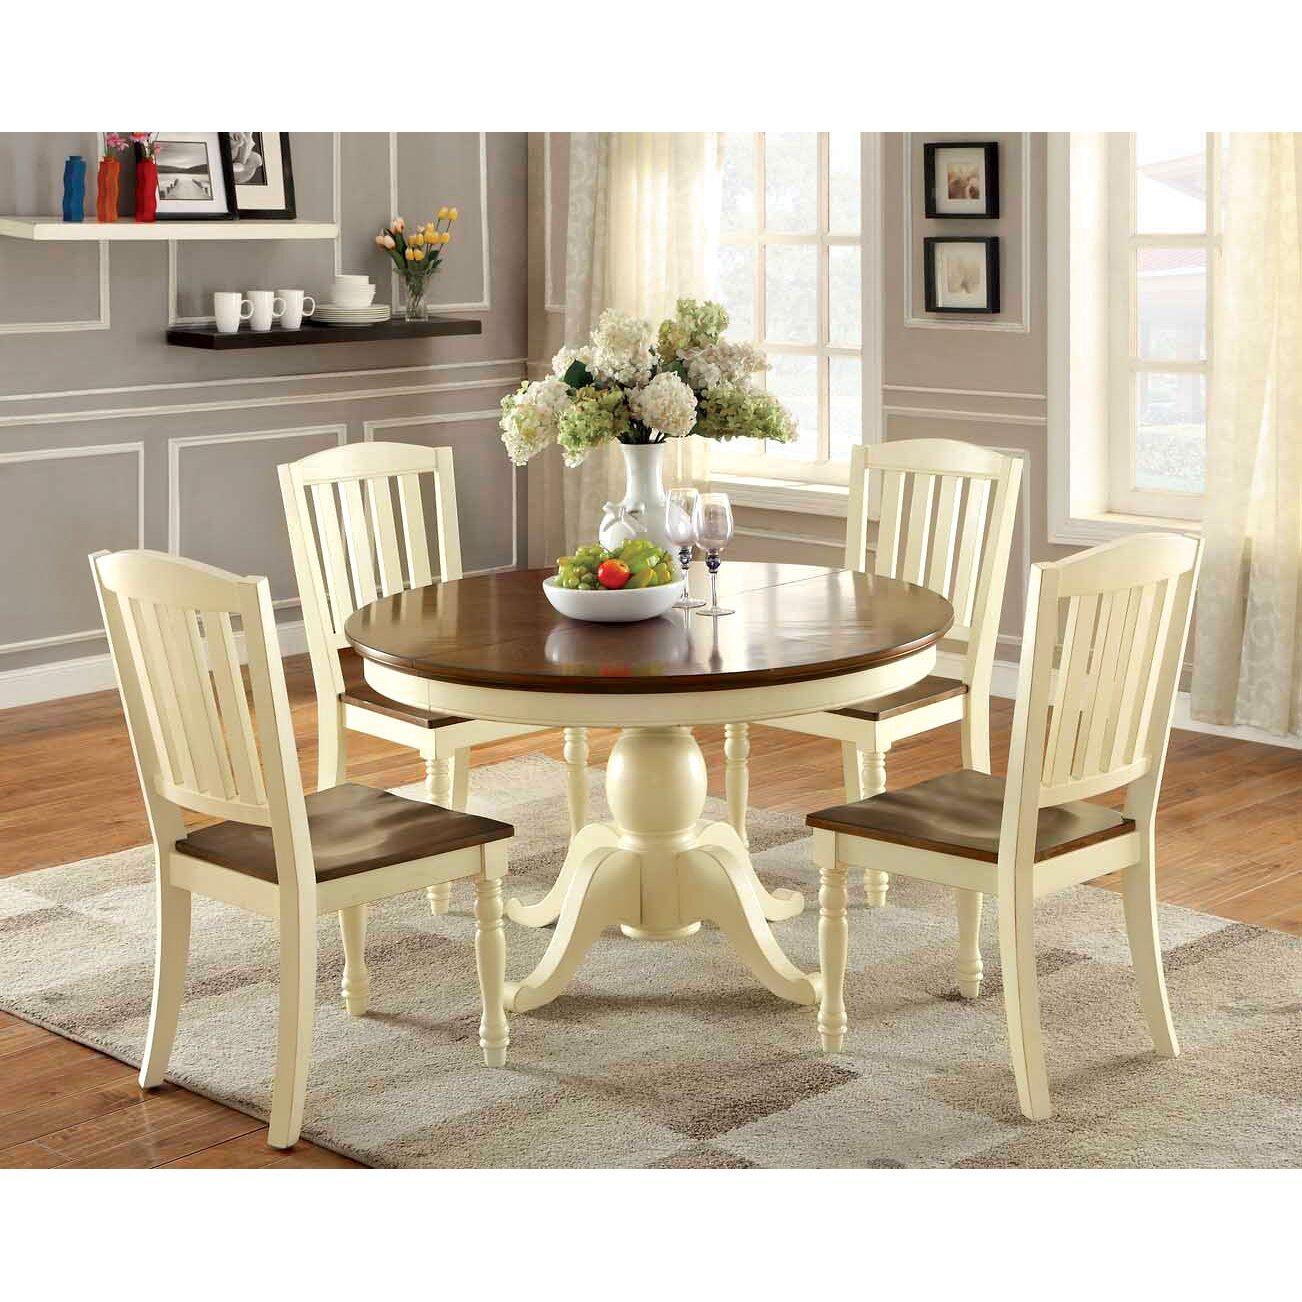 Hokku designs laureus 5 piece dining set reviews wayfair for Hokku designs dining room furniture